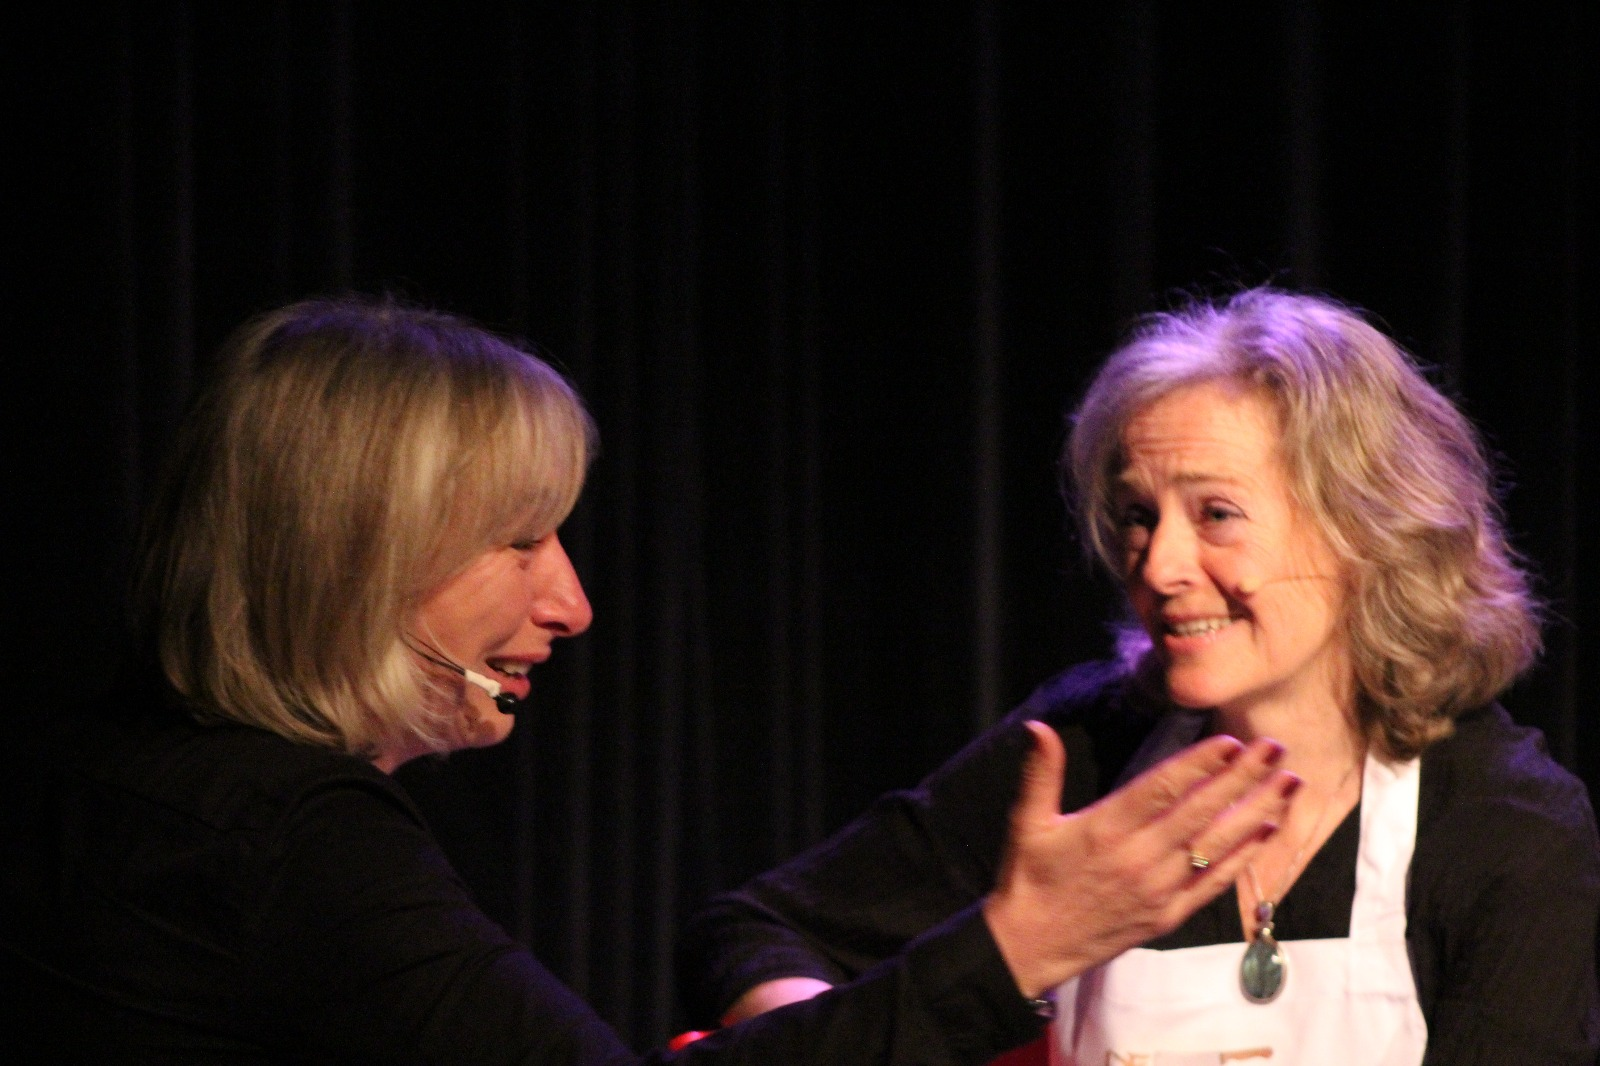 theater-samen in gesprek